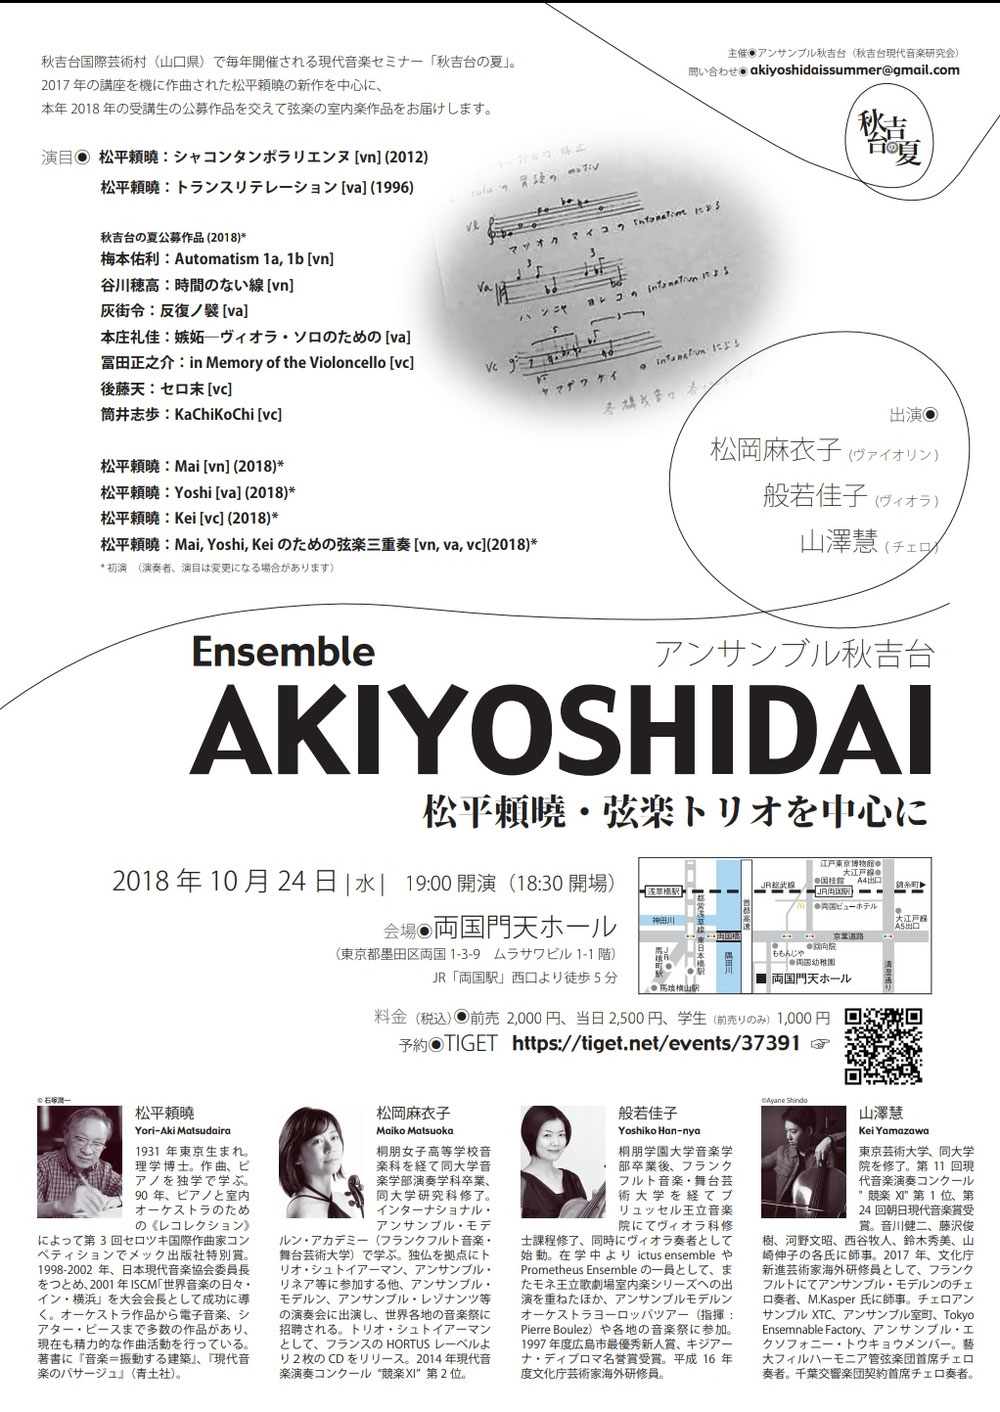 Ensemble Akiyoshidai vol.1